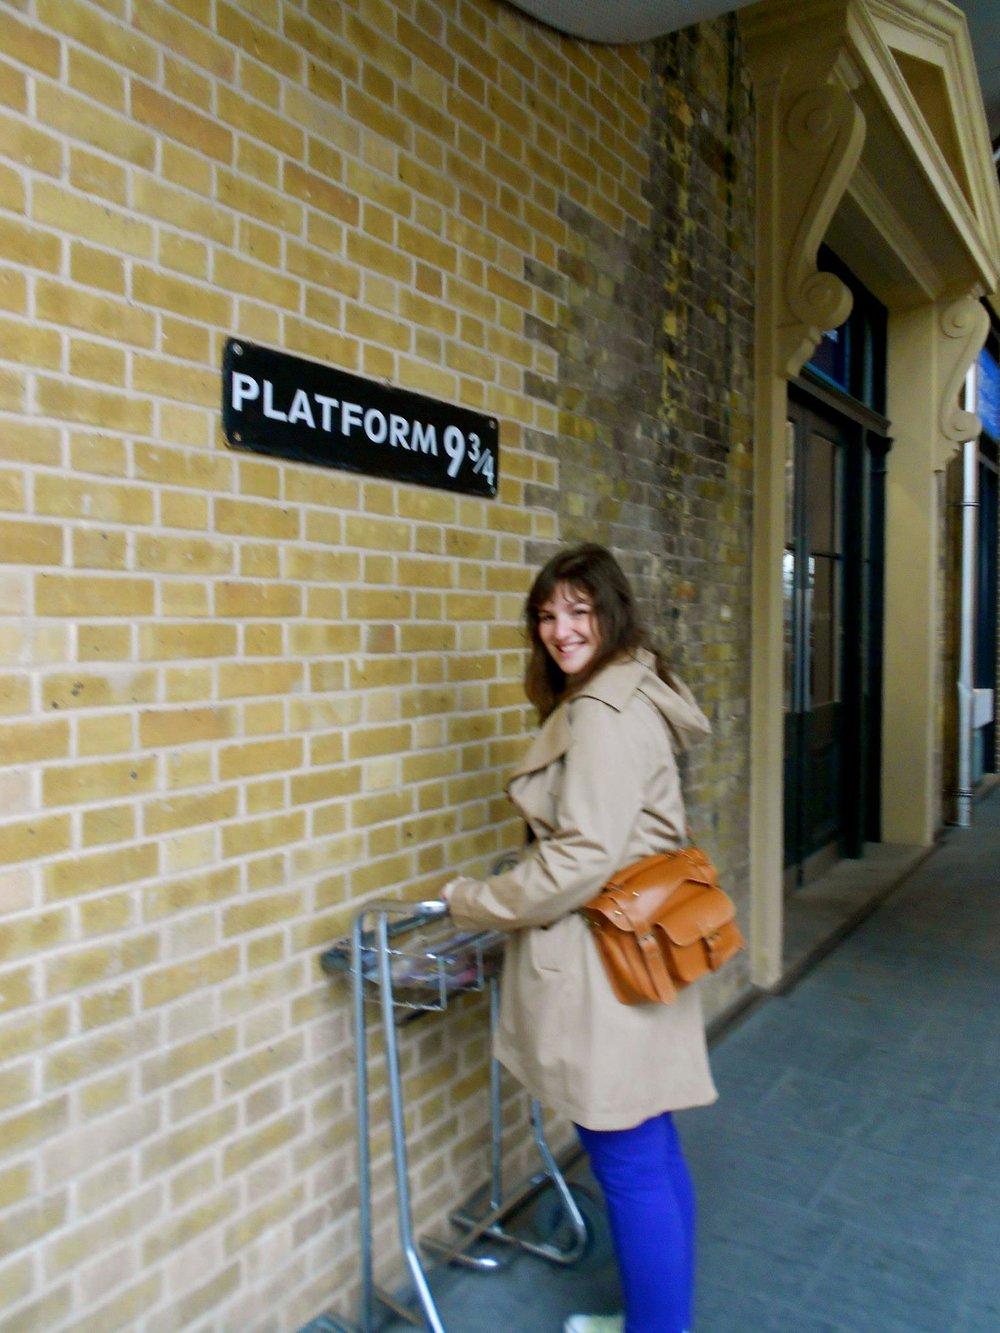 Awaiting the Hogwarts Express